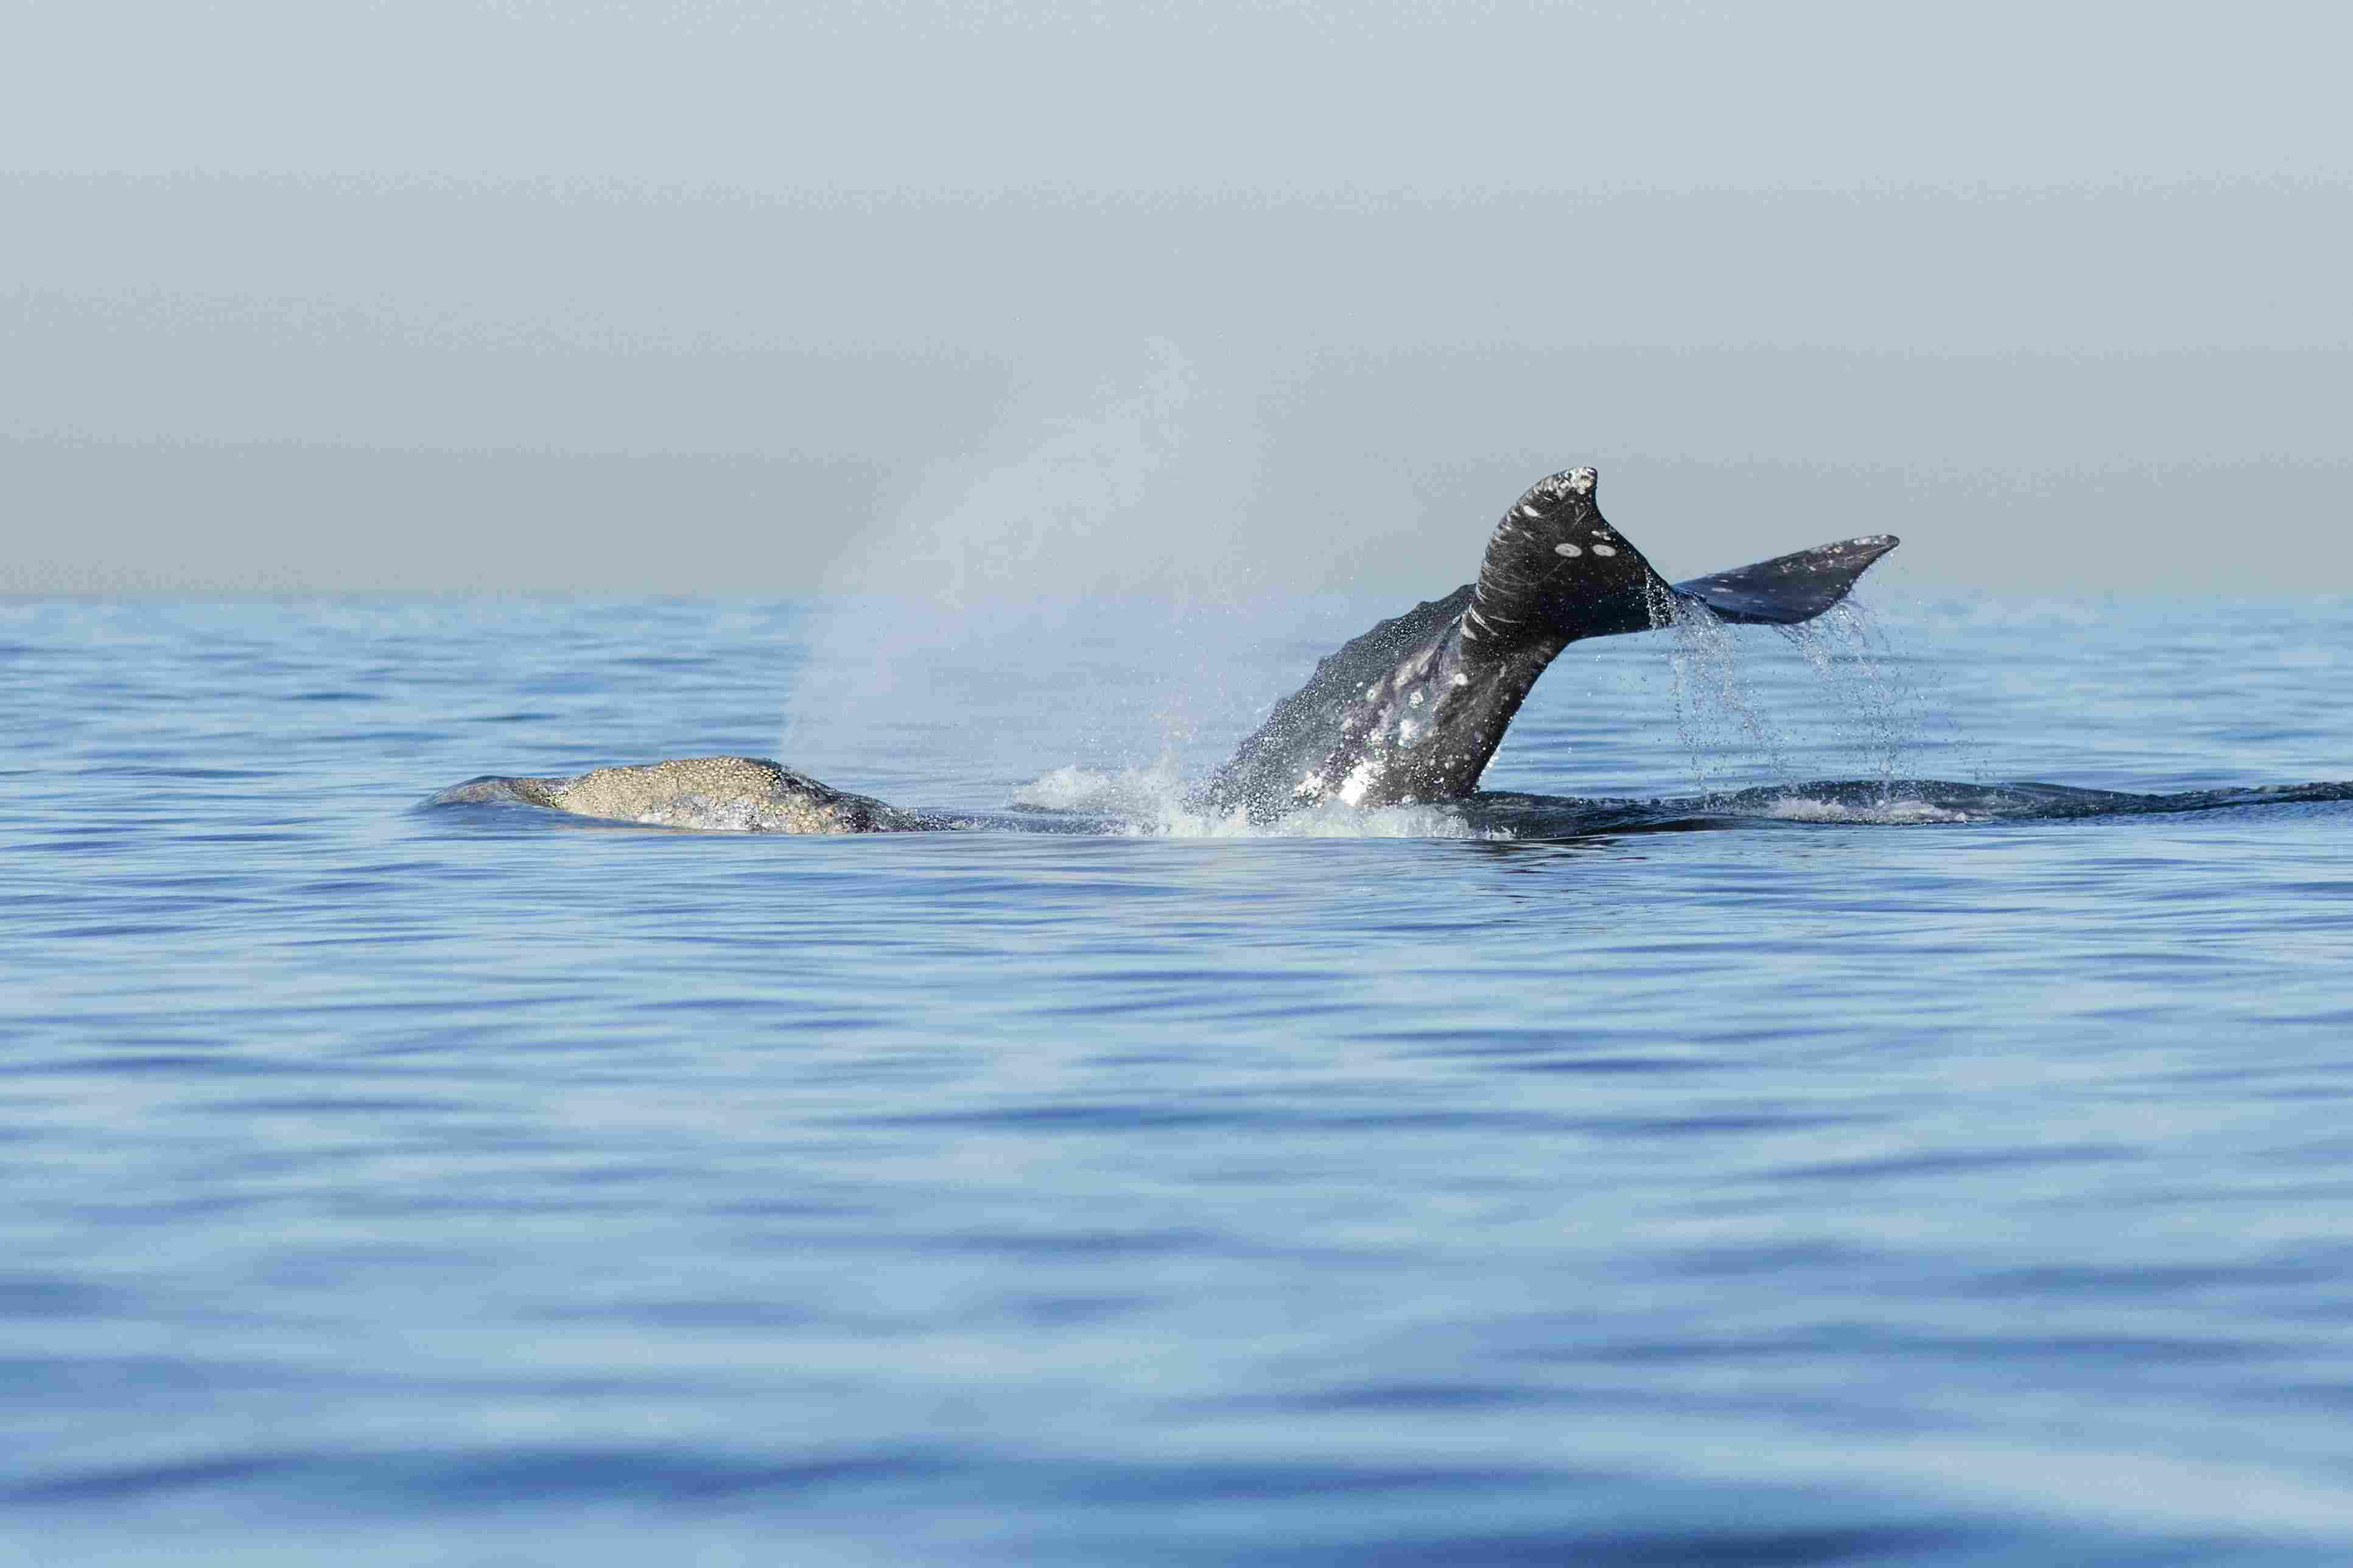 Grey whale (Eschrichtius robustus) diving, La Jolla, California, USA